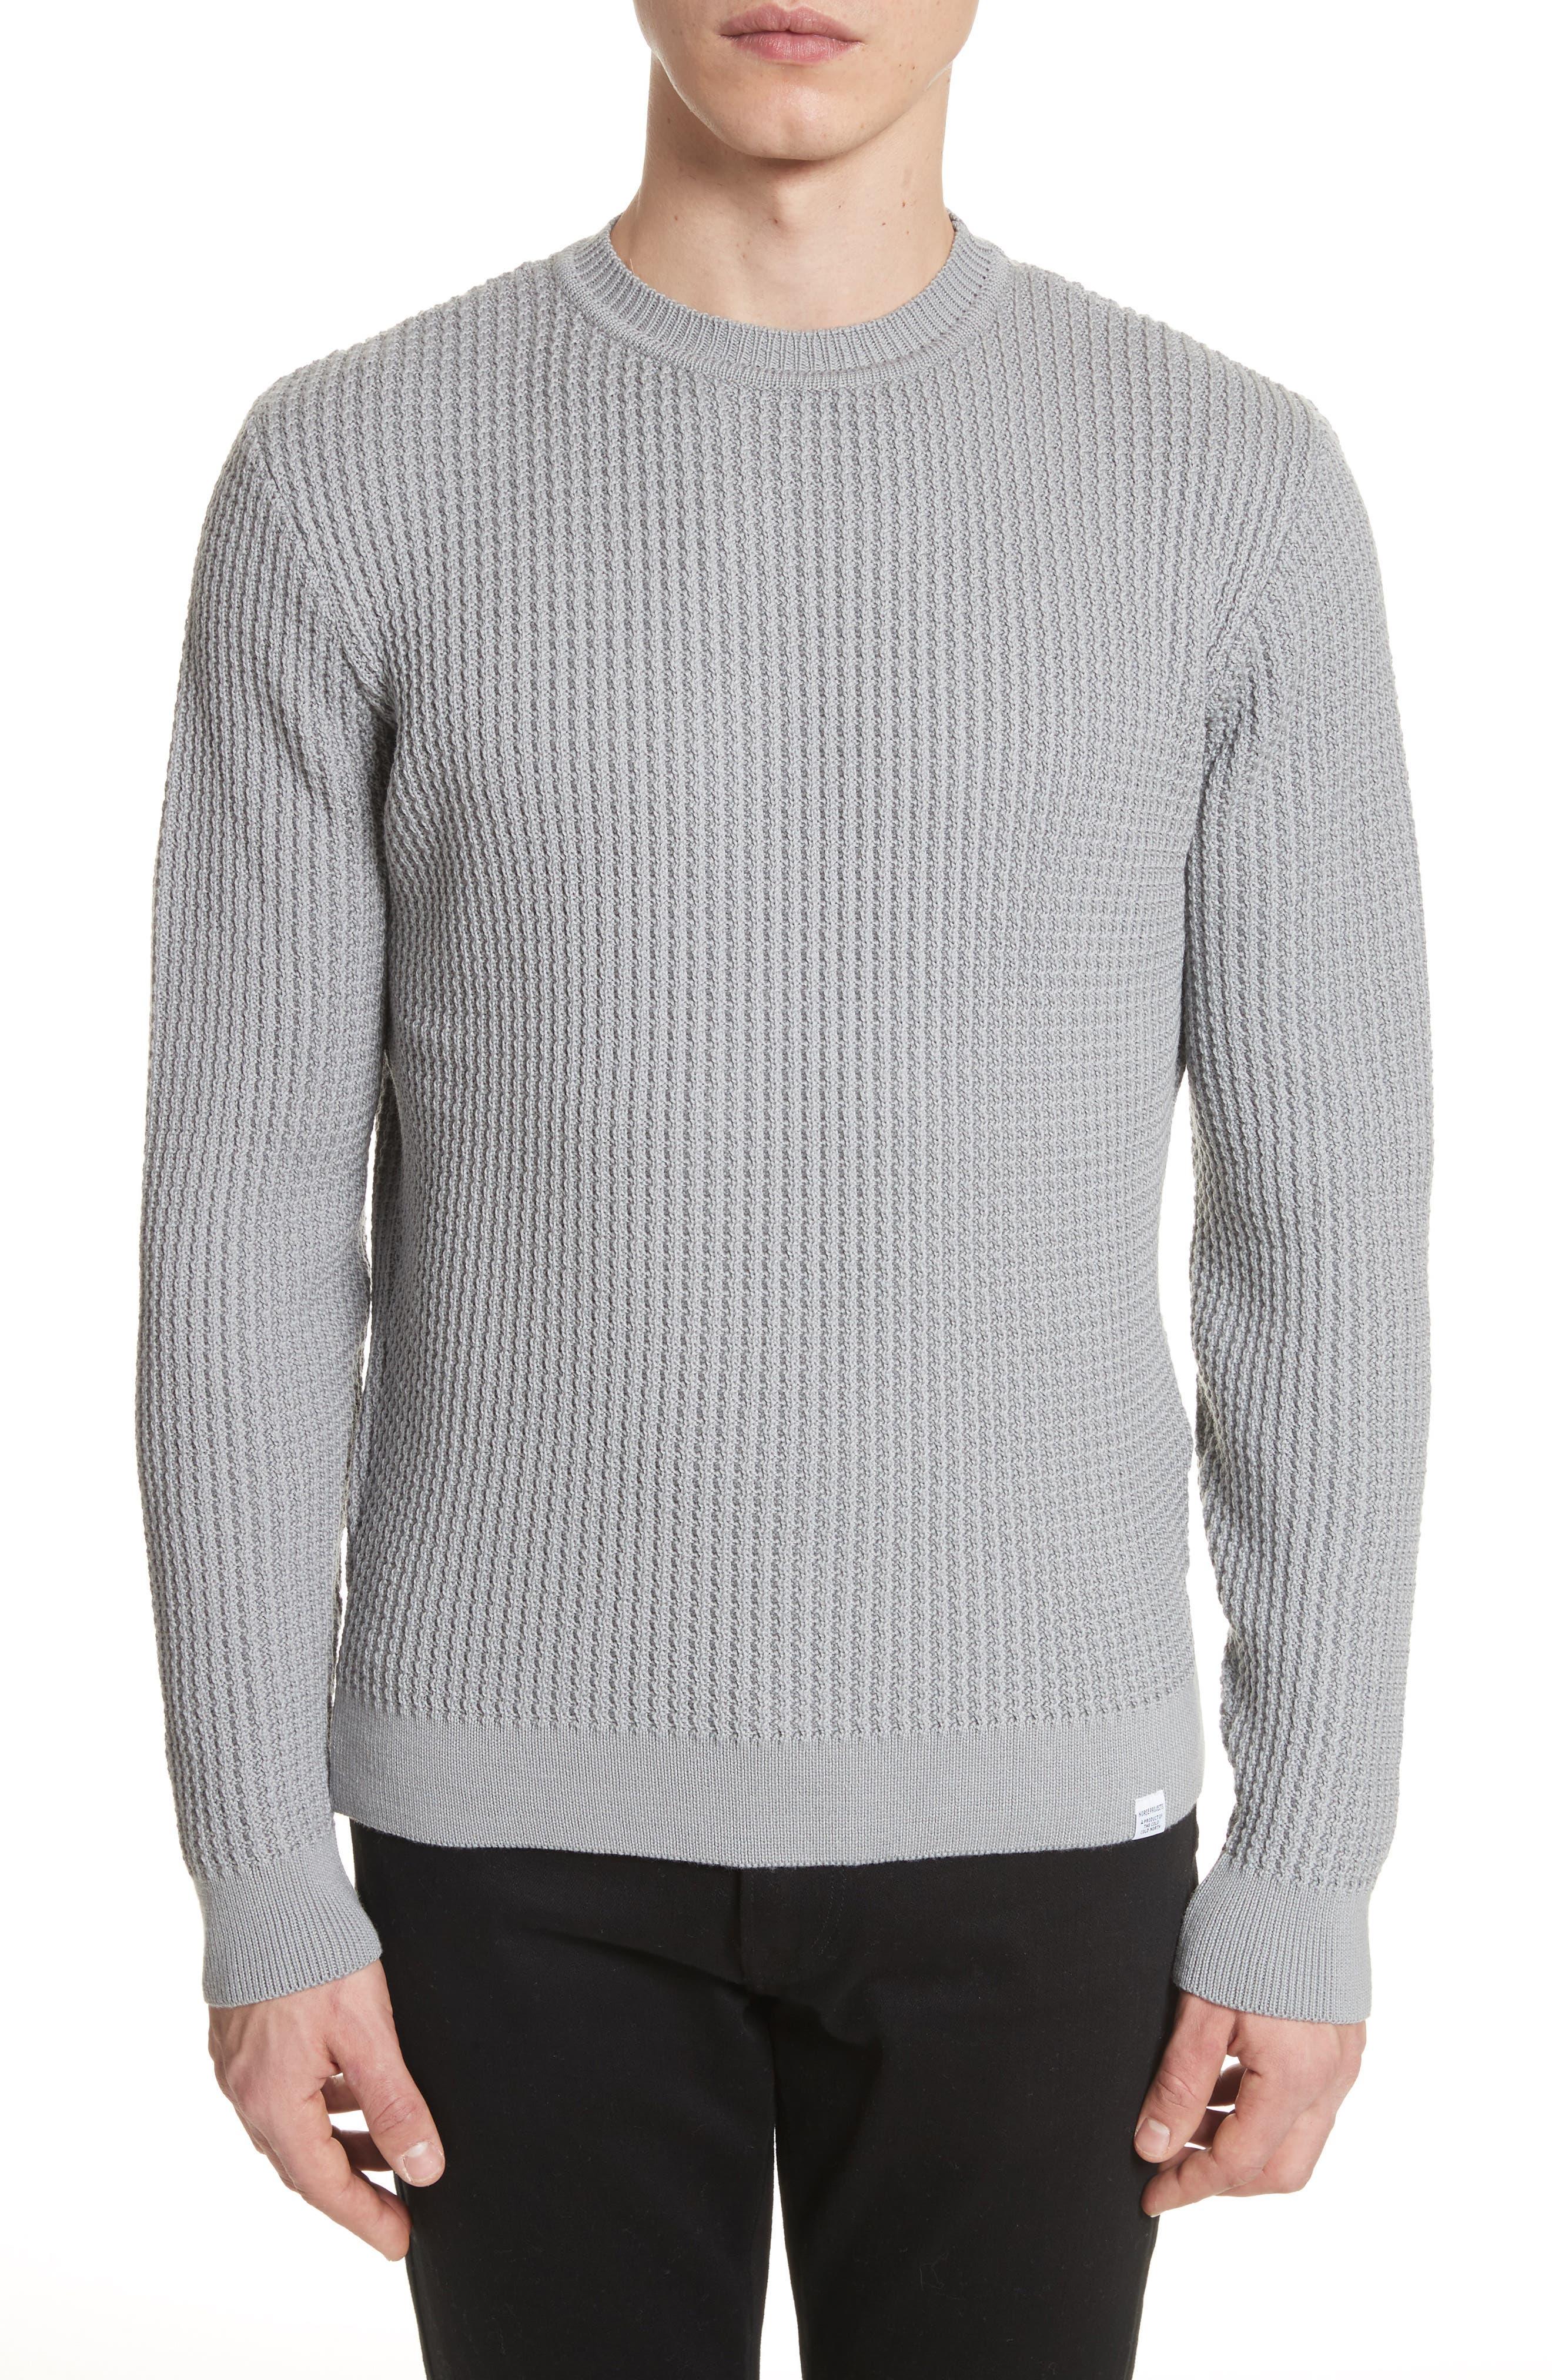 Sigfred Merino Wool Sweater,                         Main,                         color, 025